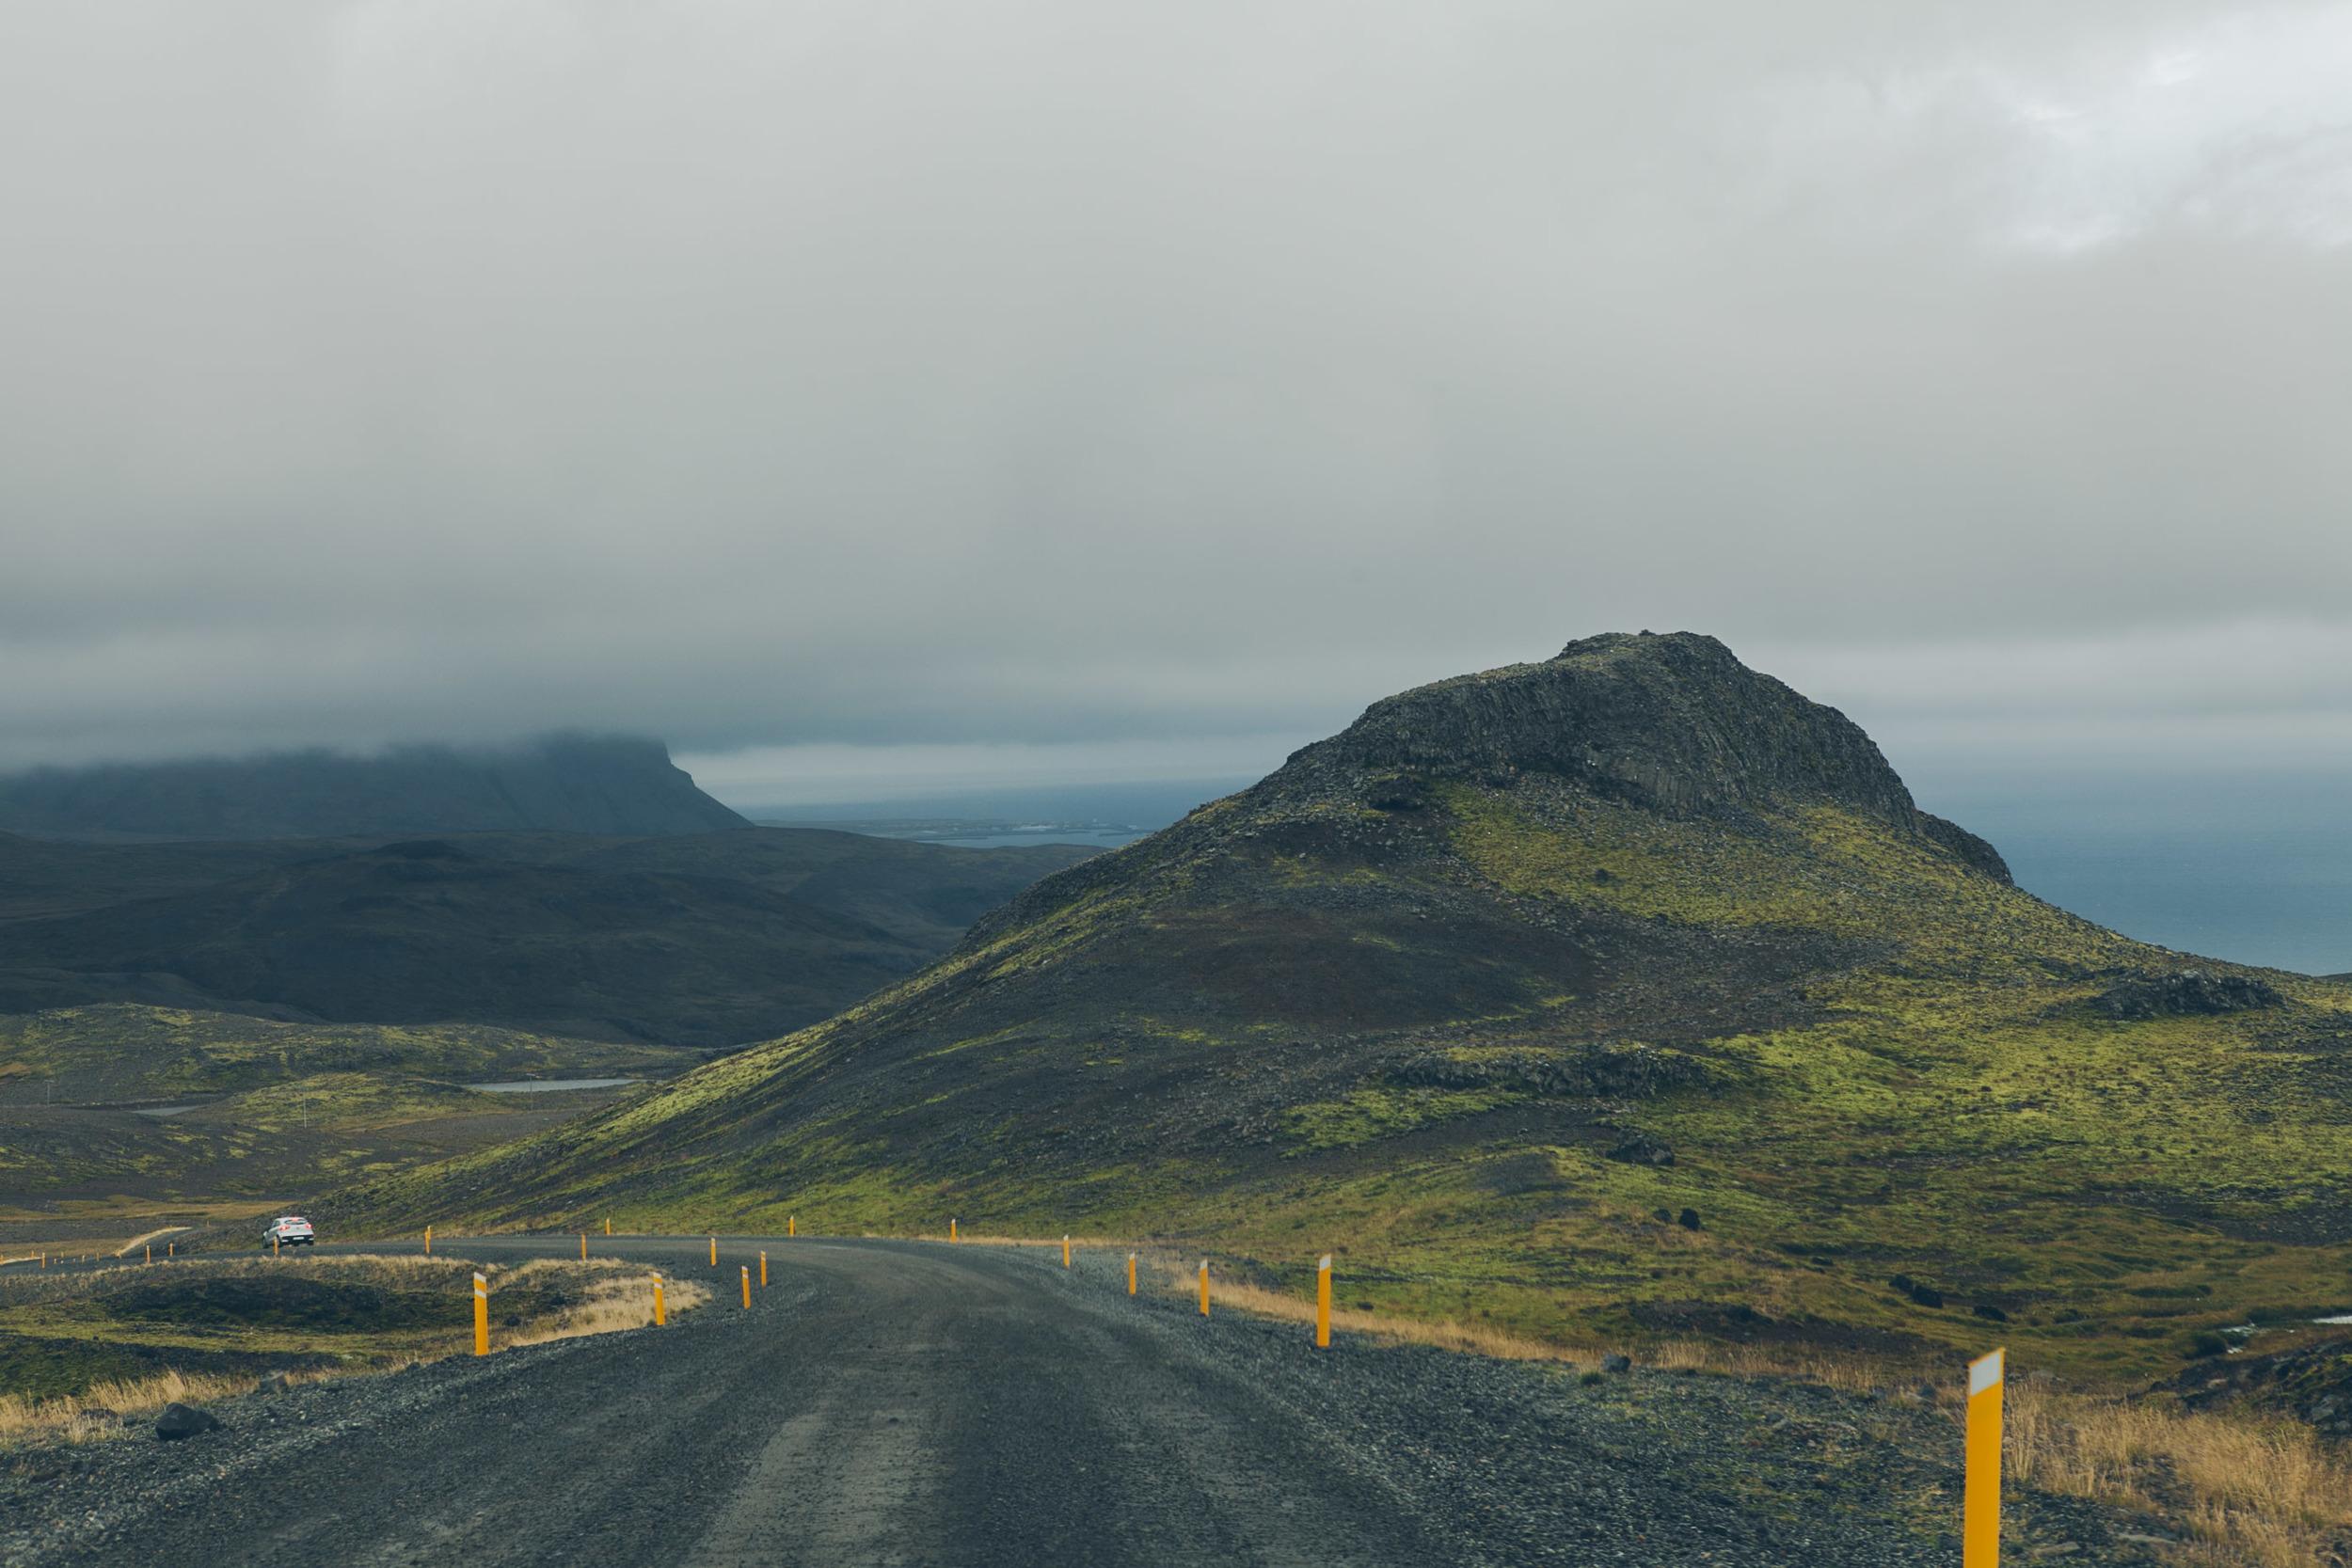 Road to Ólafsvík